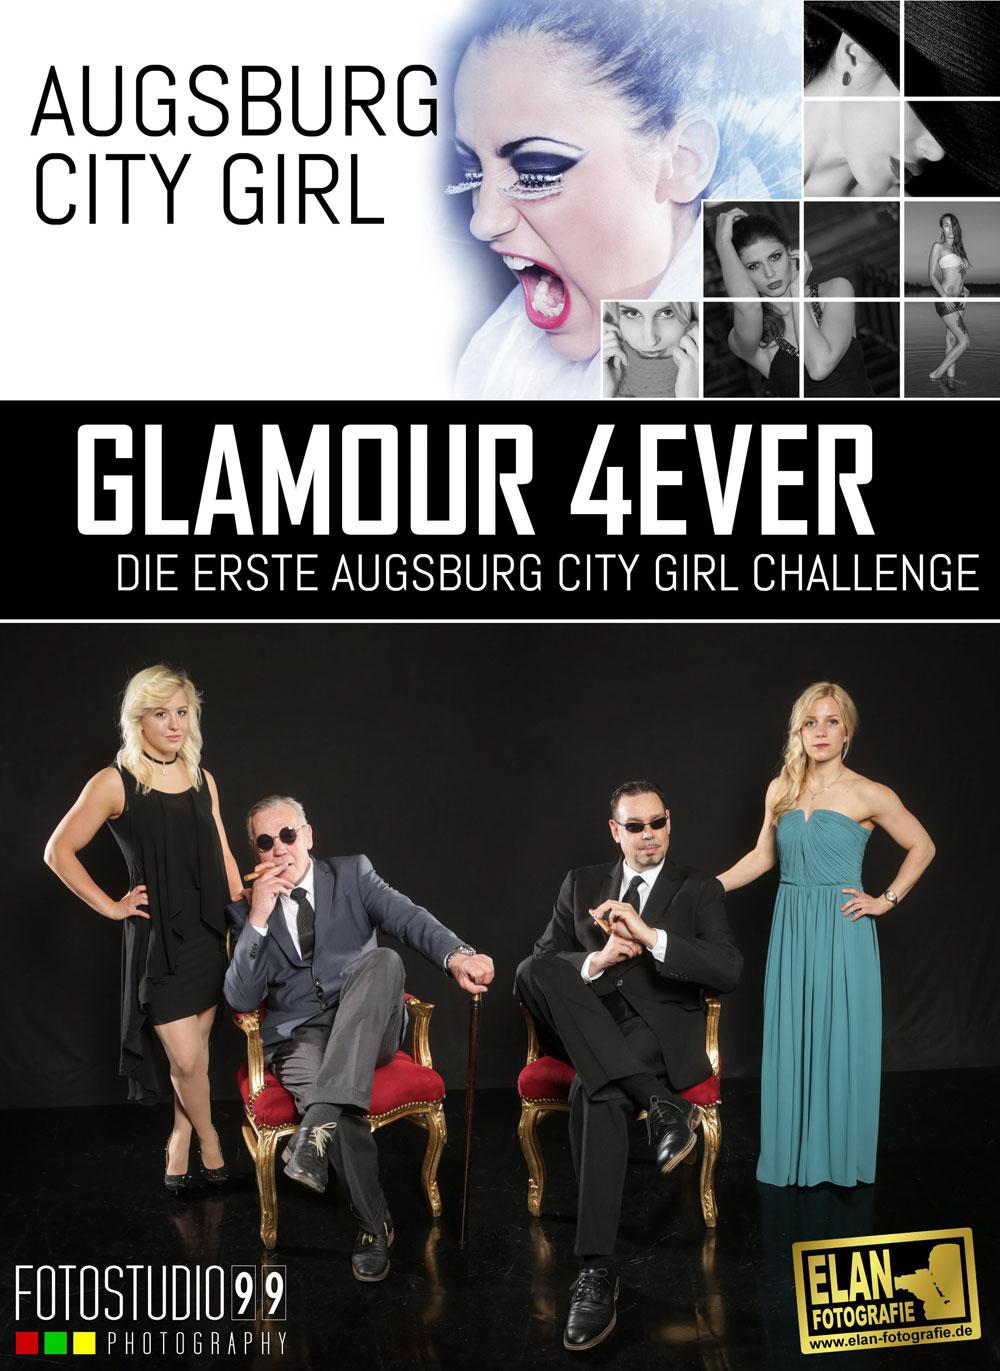 Fotoshooting Augsburg City Girl Fotostudio 99 / Elan Fotografie